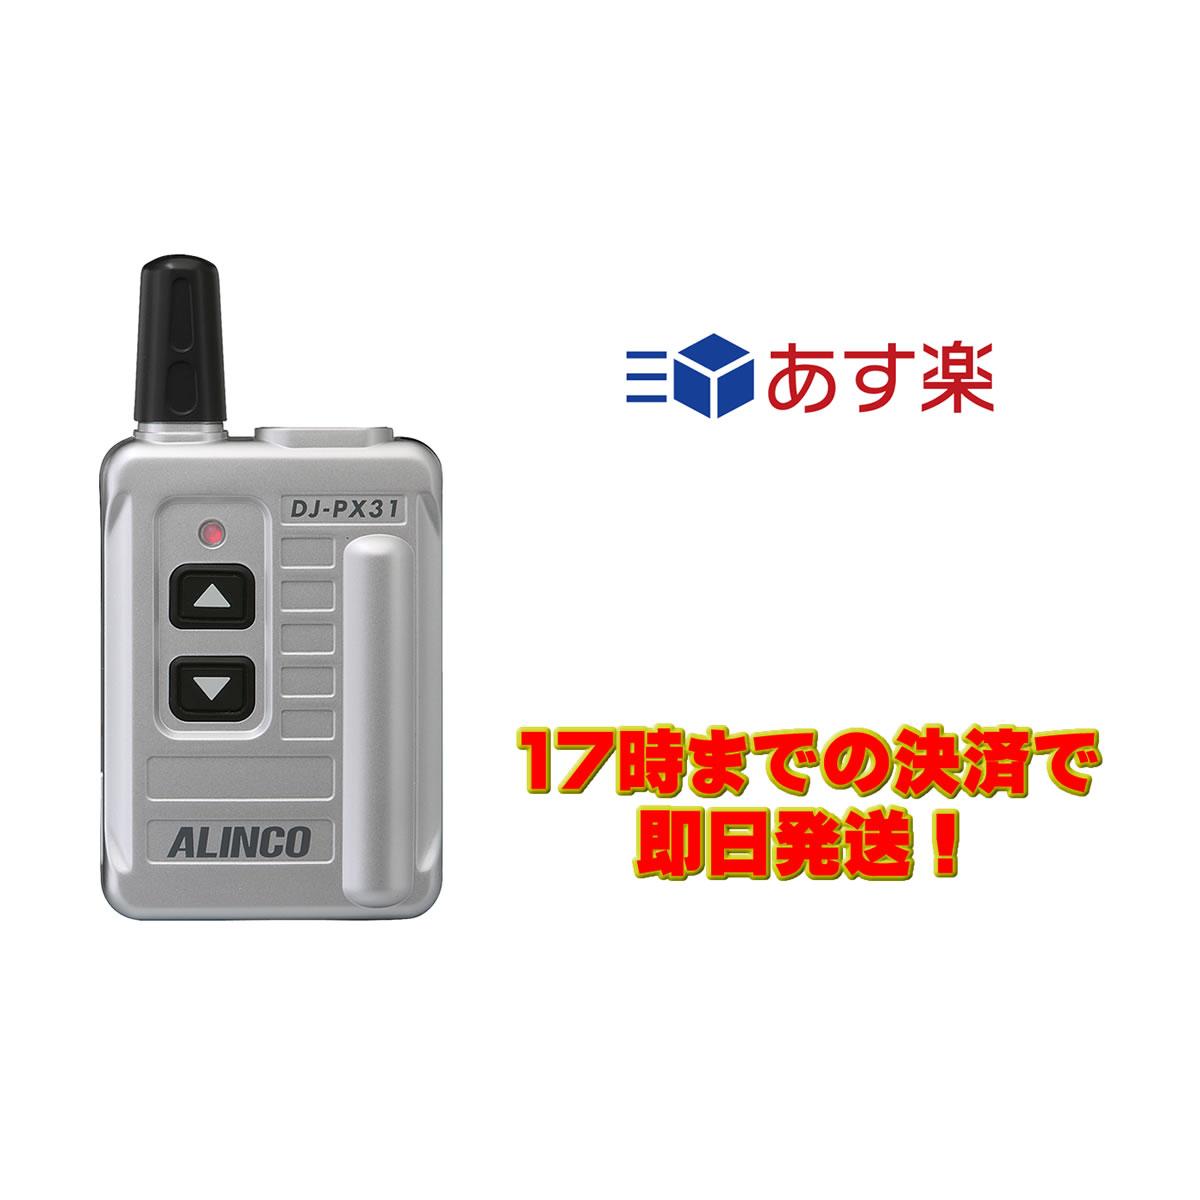 DJ-PX31(S) 47ch 中継対応 超小型 特定小電力トランシーバー